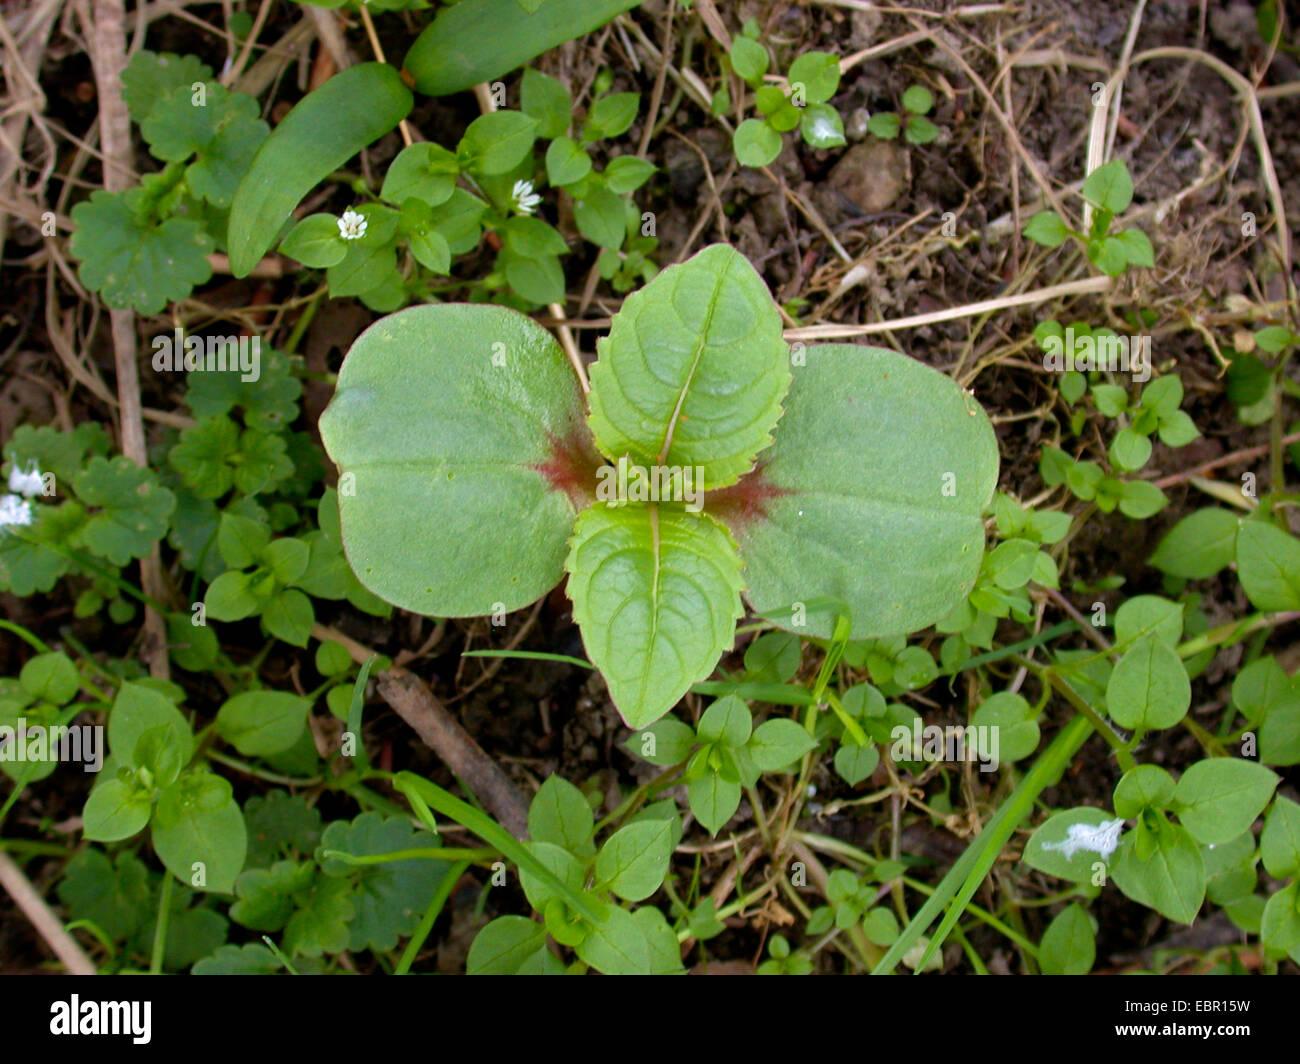 Himalayan balsam, Indian balsam, red jewelweed, ornamental jewelweed, policeman's helmet (Impatiens glandulifera), Stock Photo